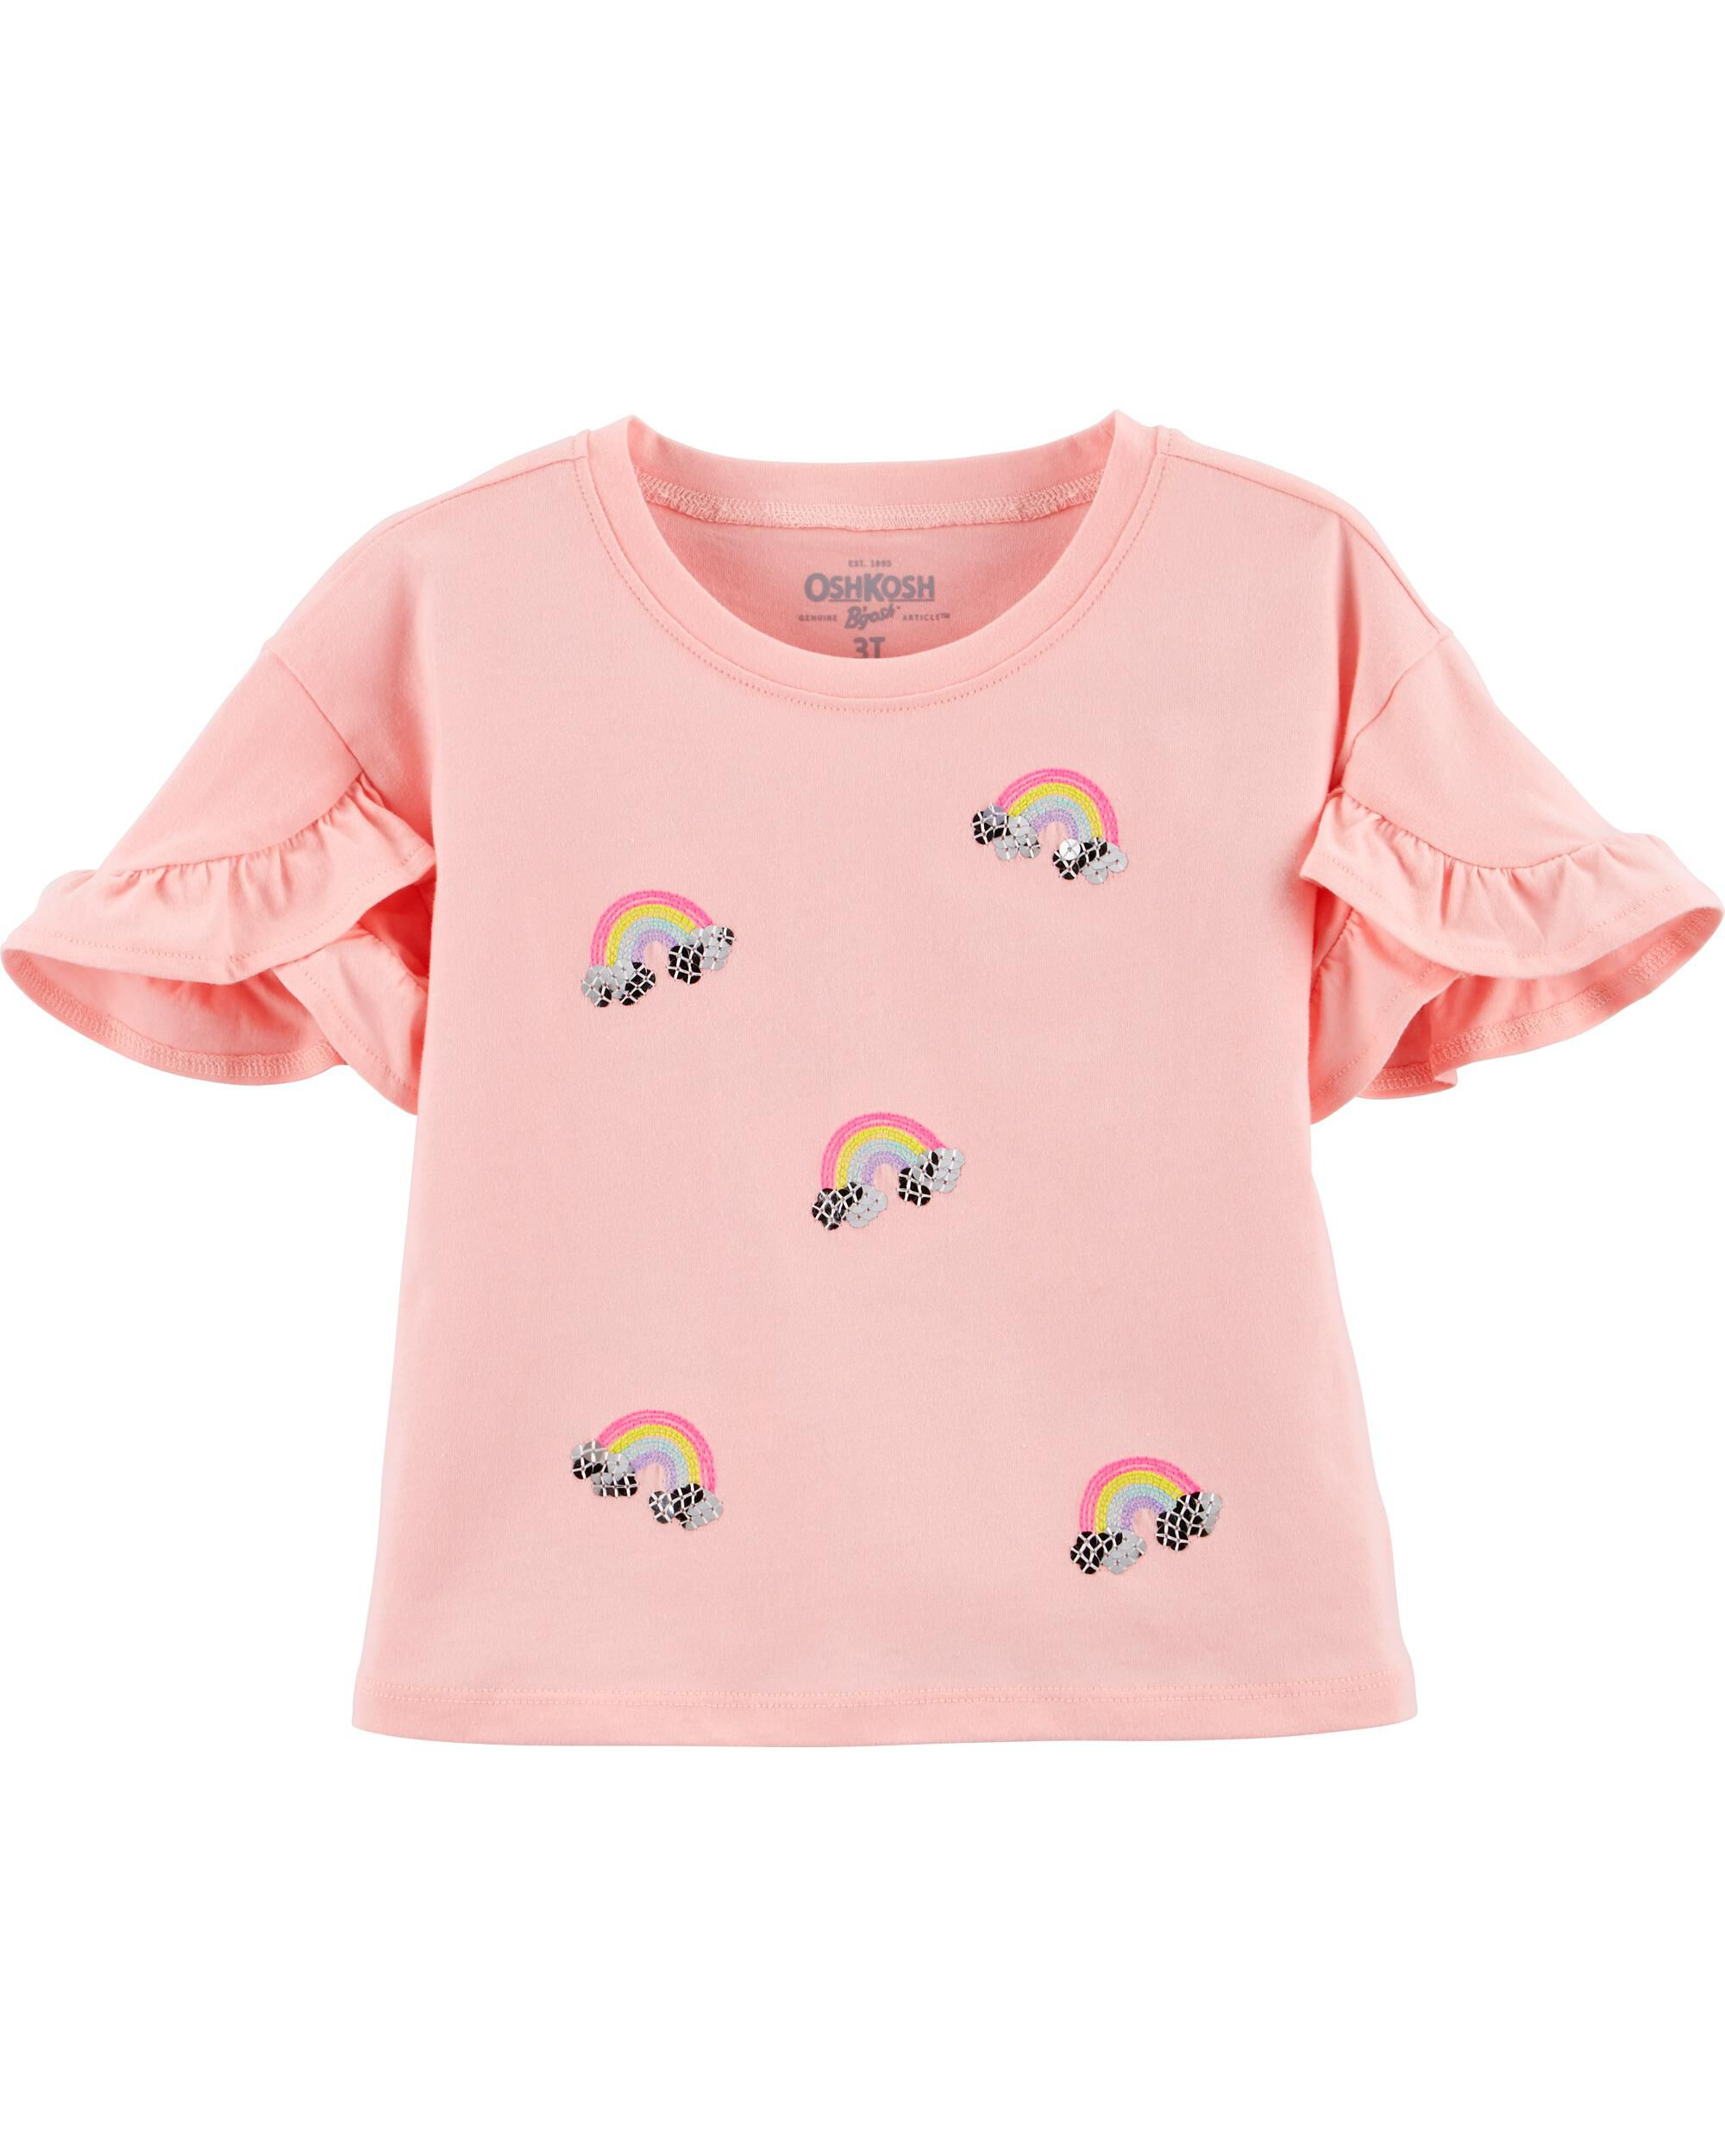 *Clearance*  Ruffle Sleeve Rainbow Top